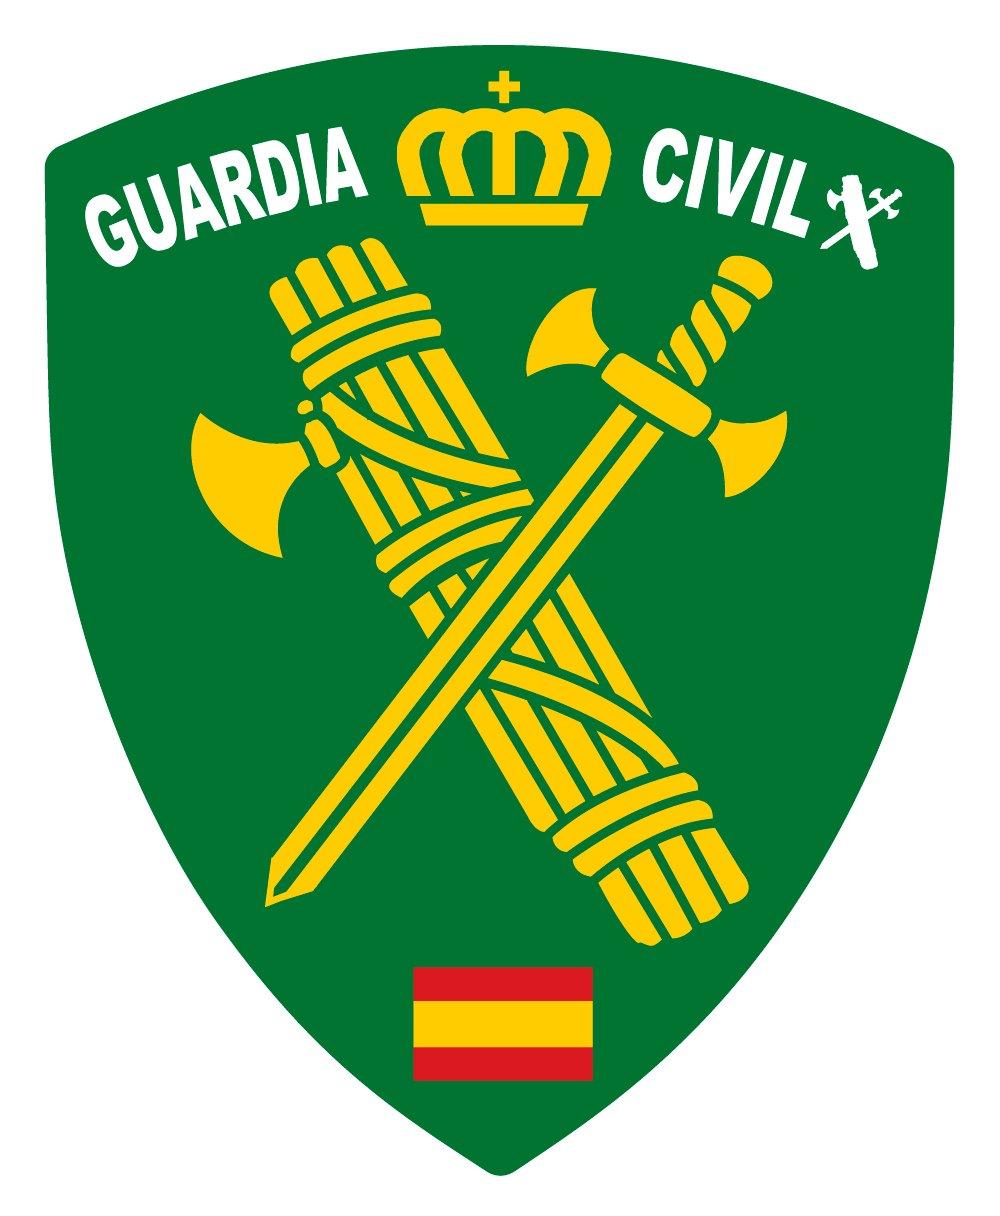 Artimagen Pegatina Escudo Pico Logotipo Guardia Civil 40x60 mm. Ediciones Imagina S.L.